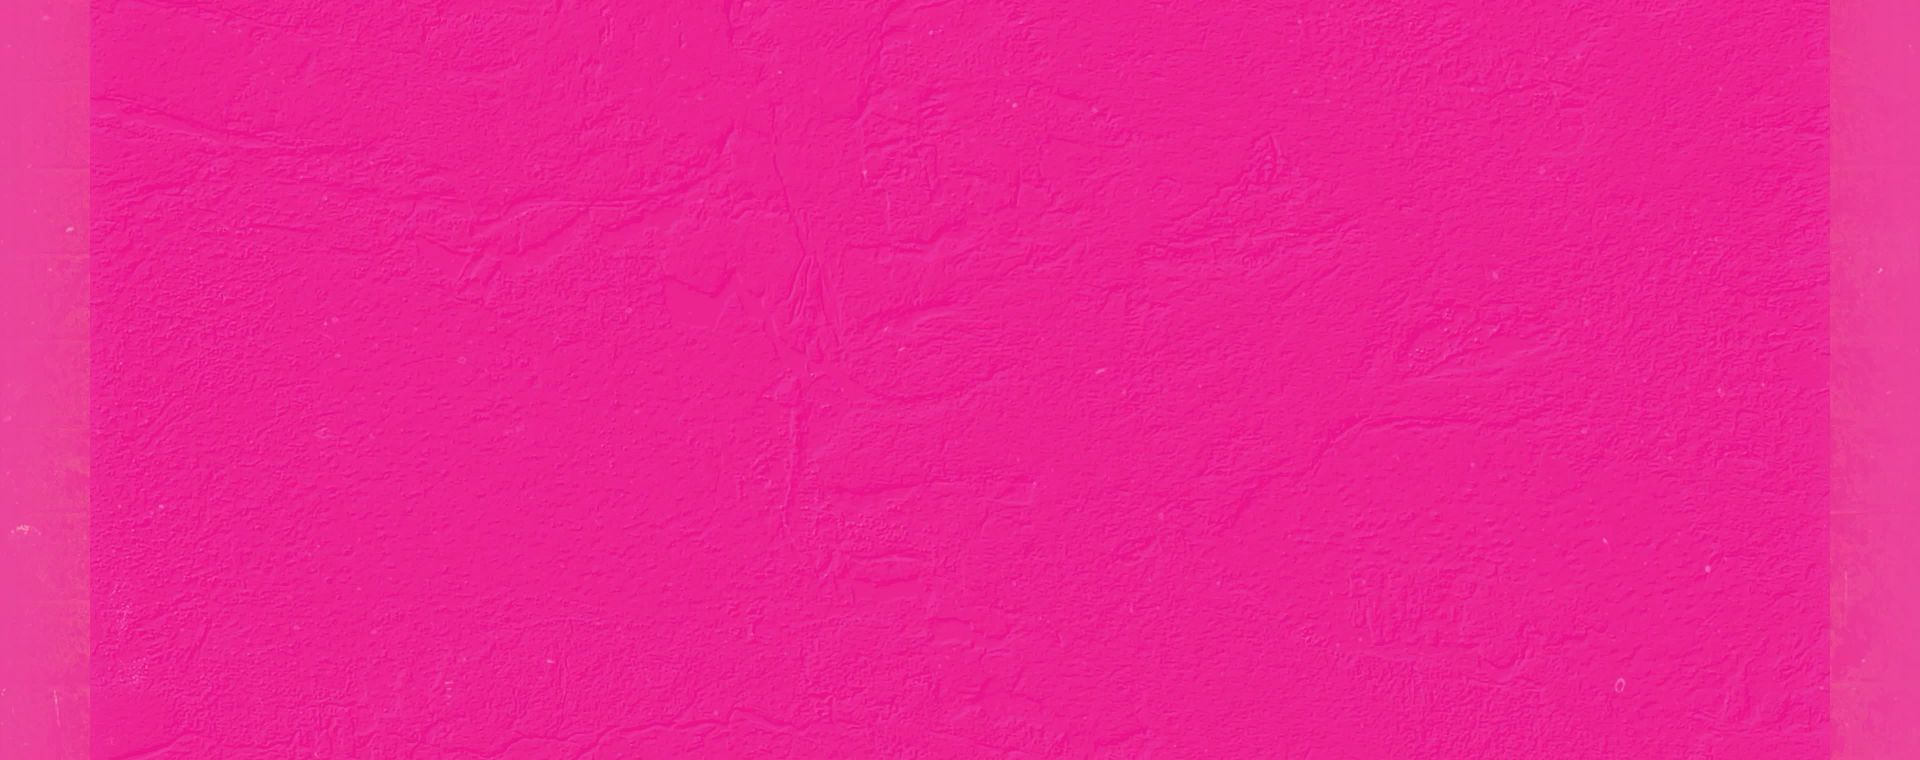 BITIMAG 07042020Jessie J and Channing Tatum Split… Again